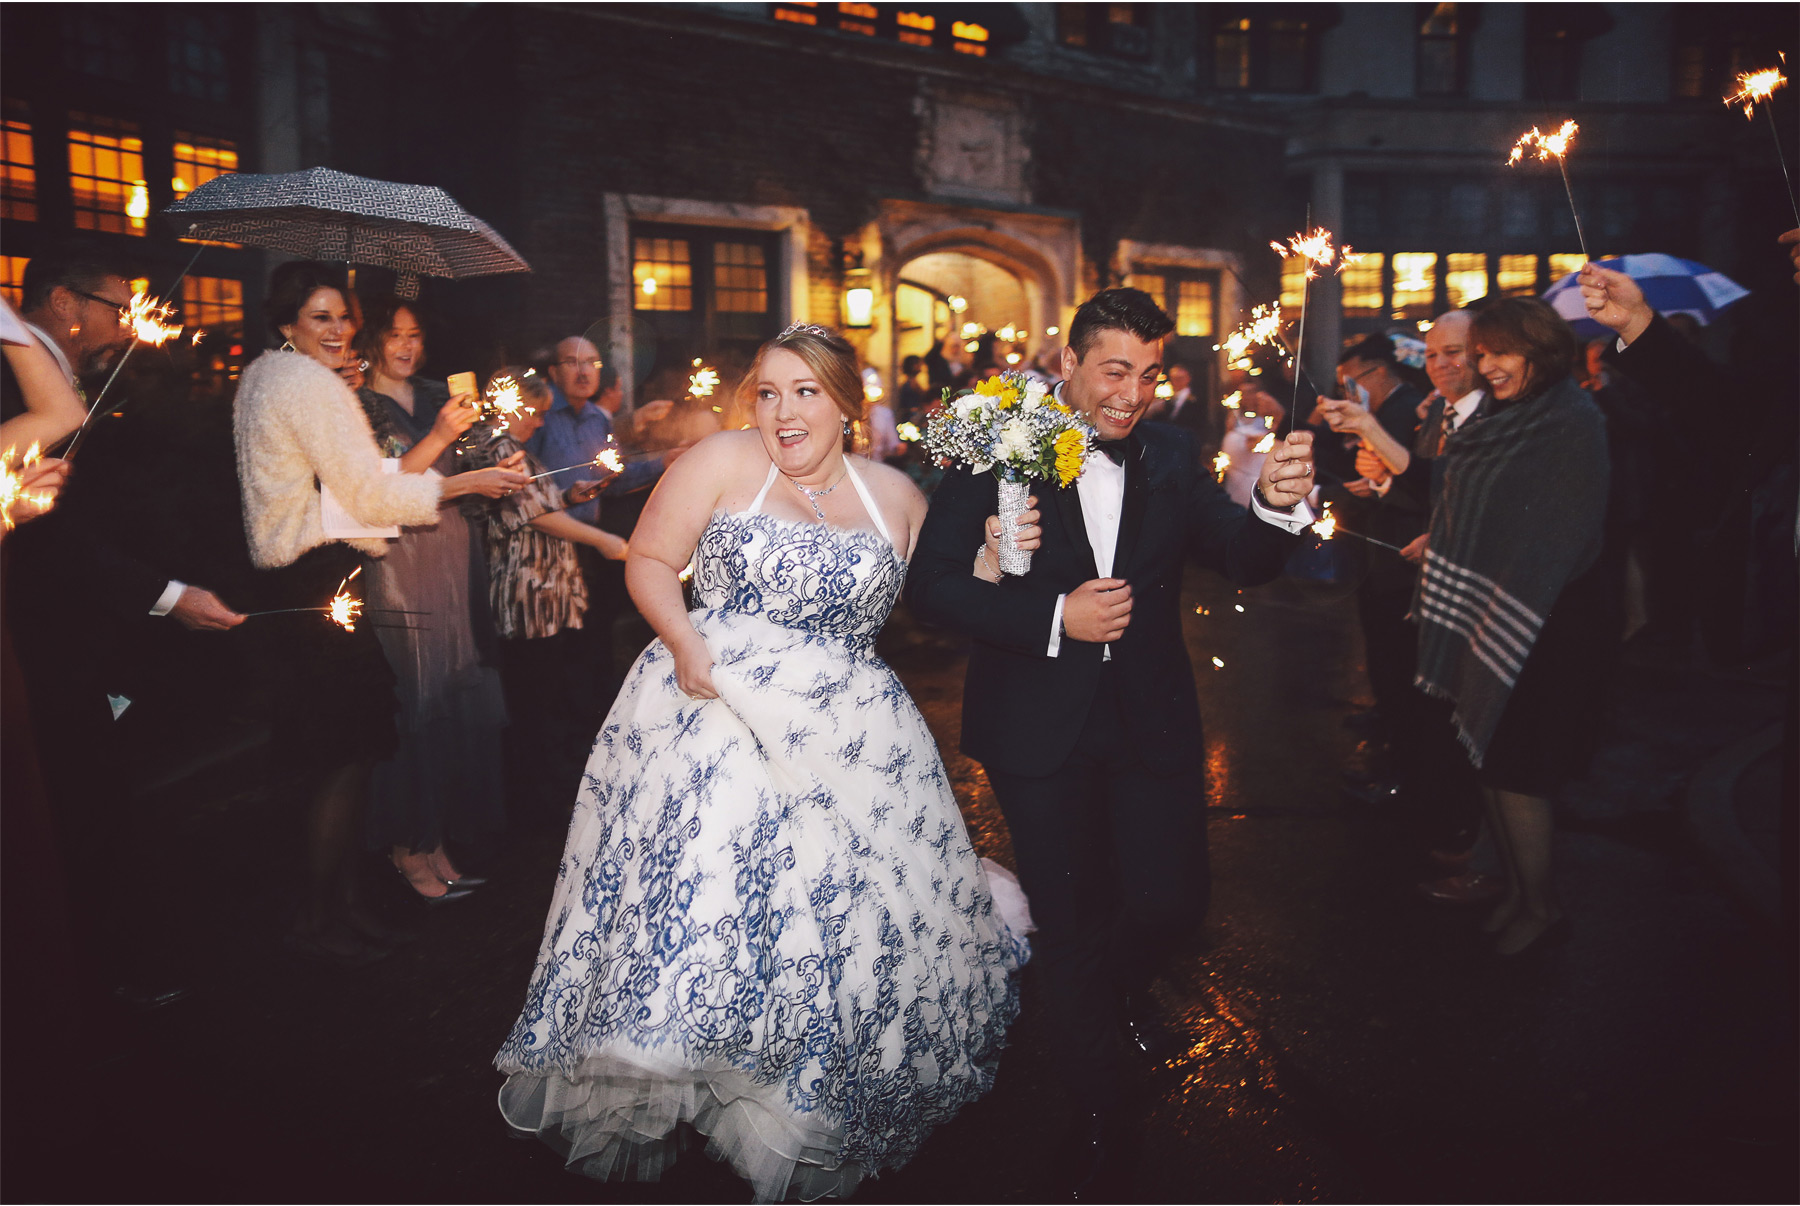 09-Saint-Paul-Minnesota-Wedding-Photography-by-Vick-Photography-The-University-Club-Sparklers-Send-Off-Mari-and-Giuseppe.jpg